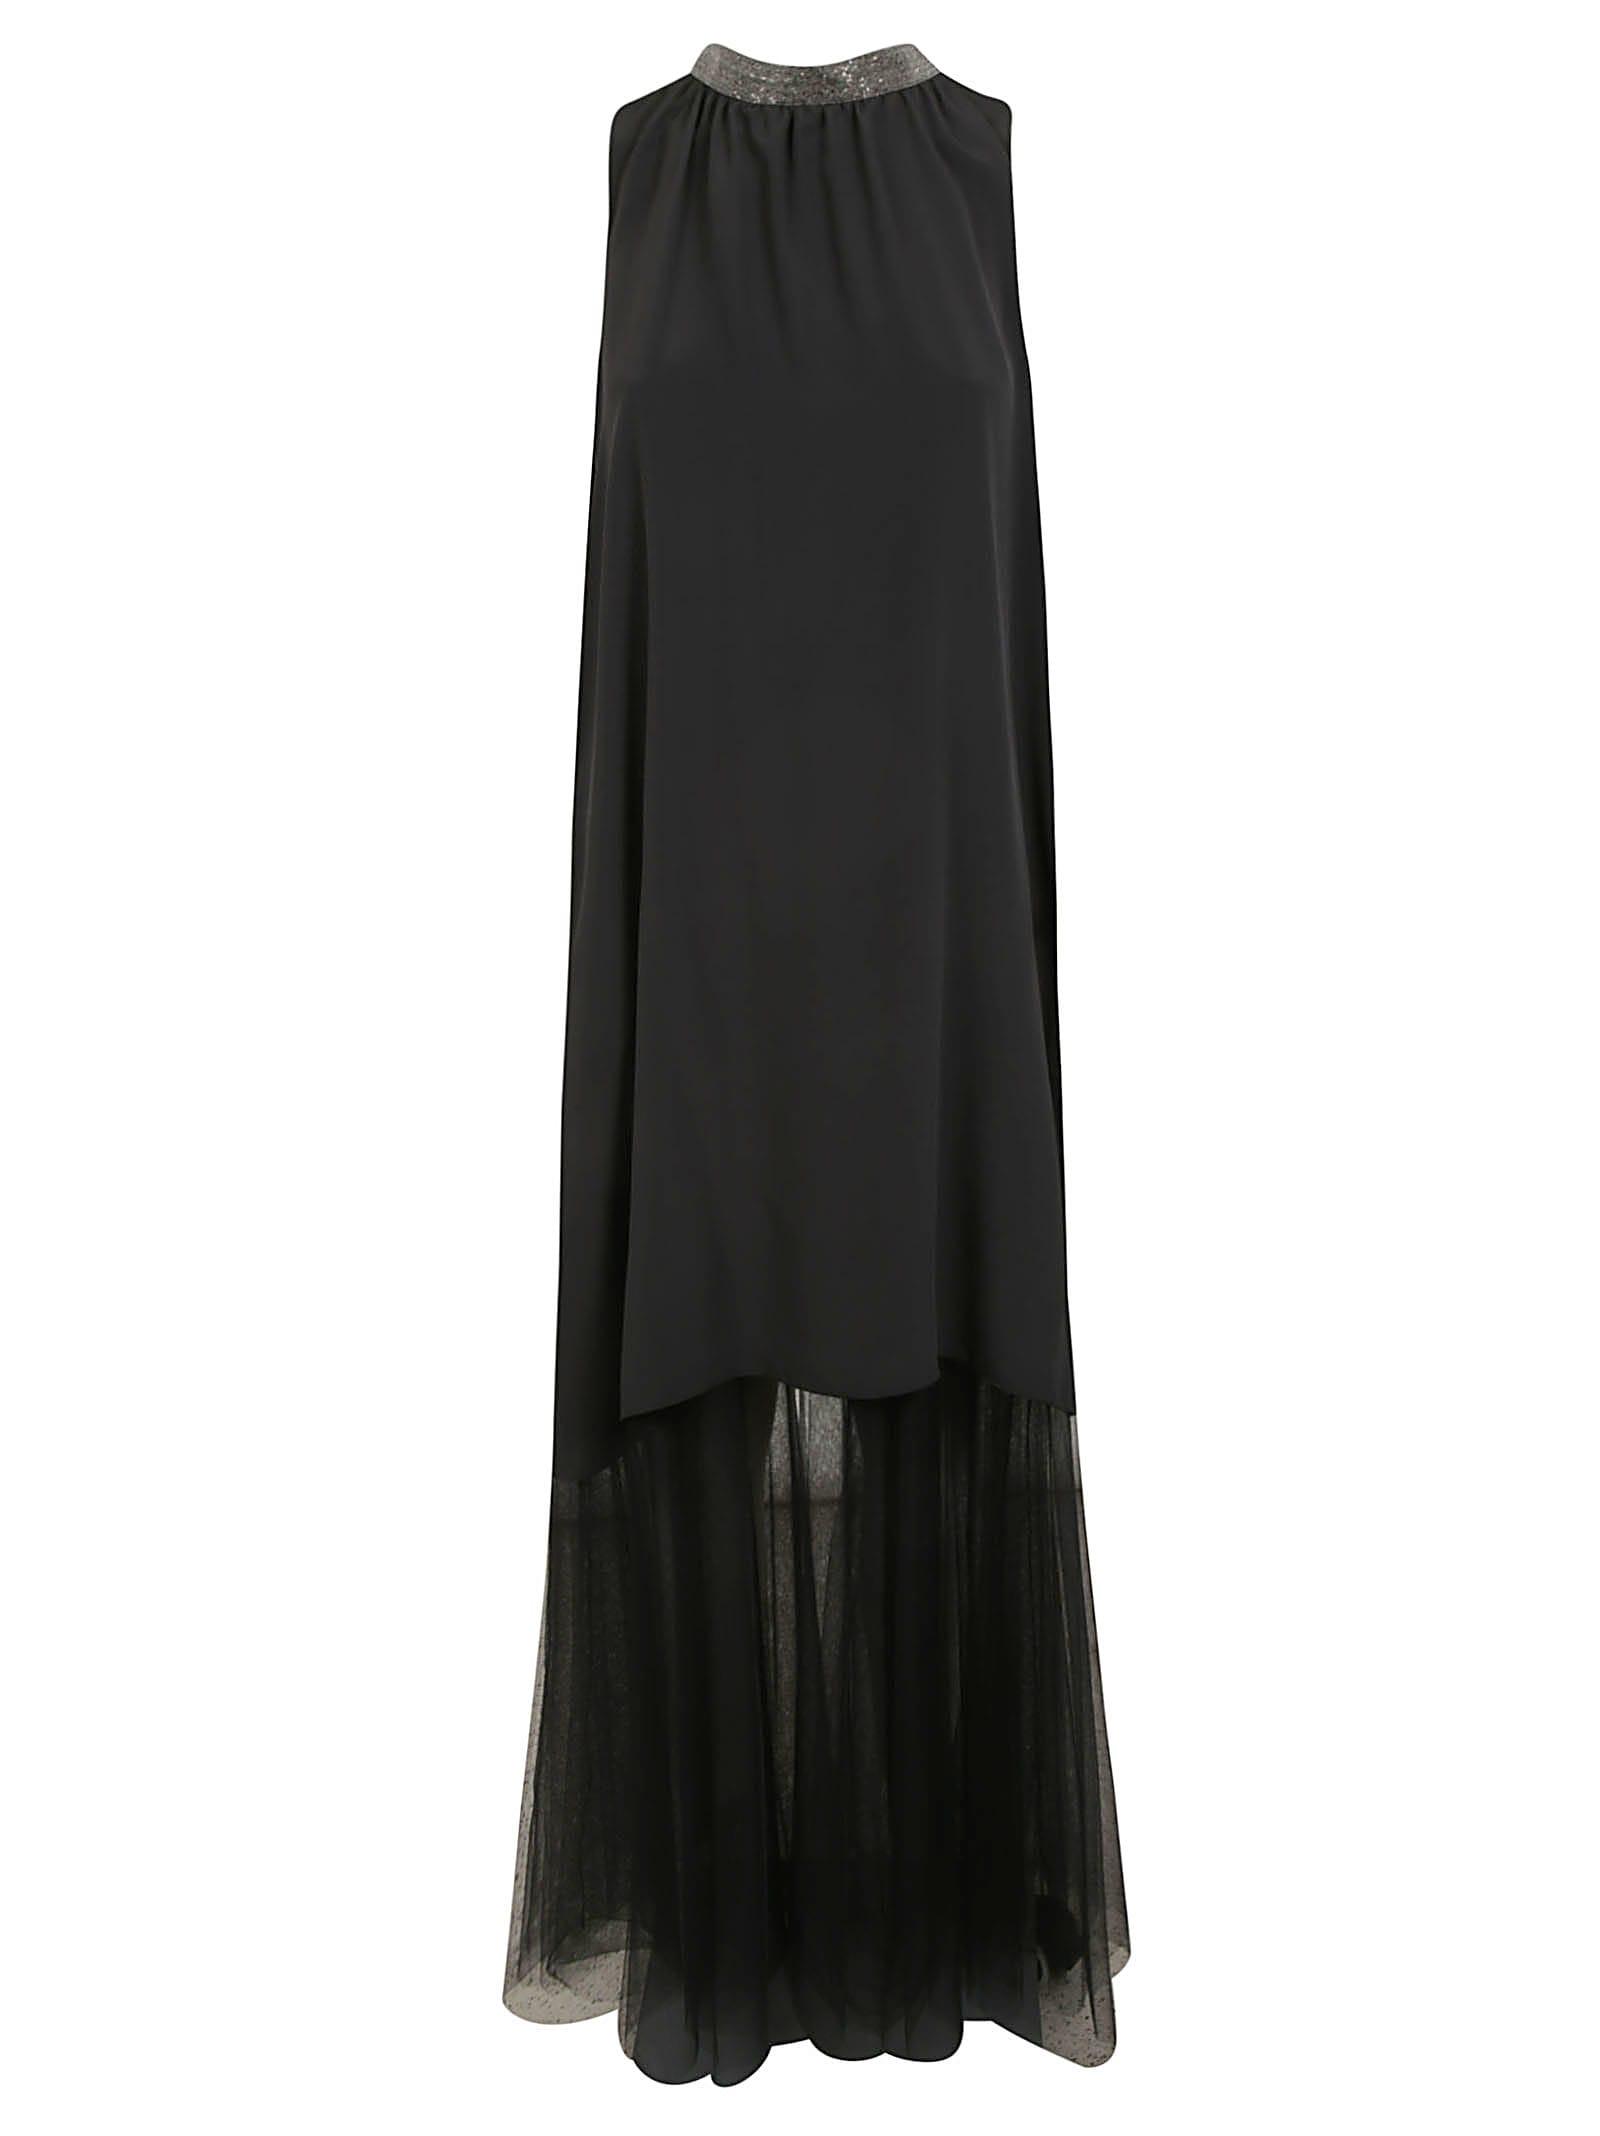 Buy Fabiana Filippi Sleeveless Long Fringed Dress online, shop Fabiana Filippi with free shipping